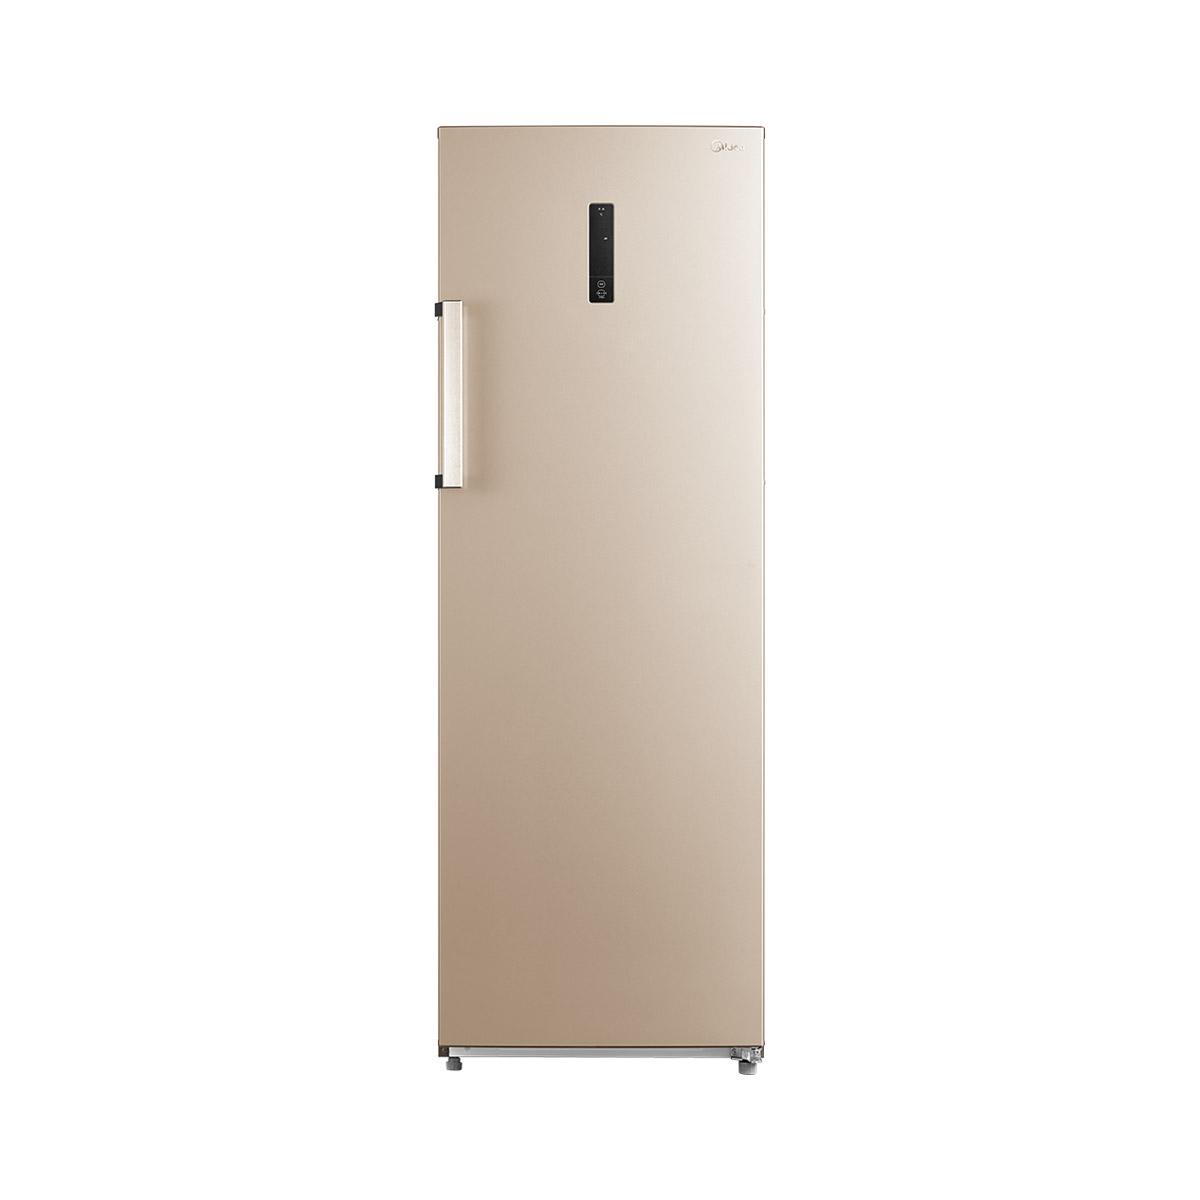 Midea/美的 BD/BC-240WE冰箱 说明书.pdf